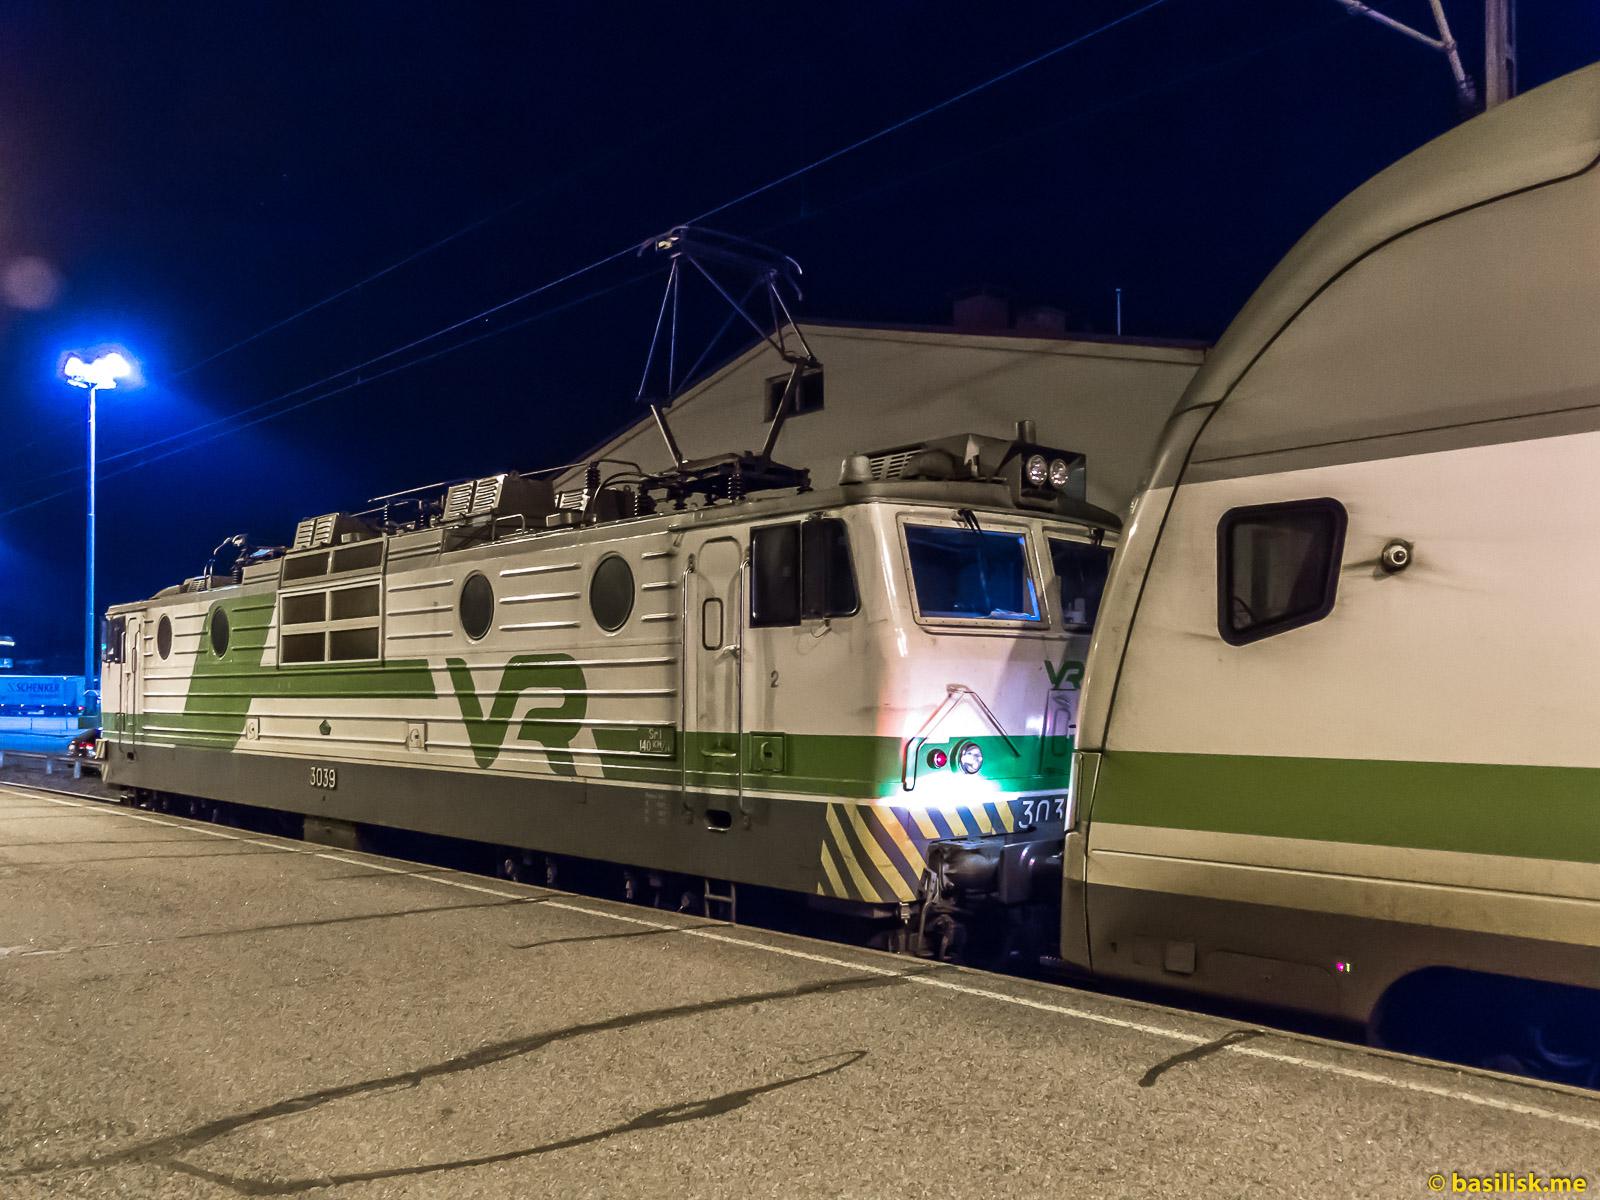 Железнодорожная станция Turun Satama. Turku Harbour train station. Порт Турку. Январь 2018